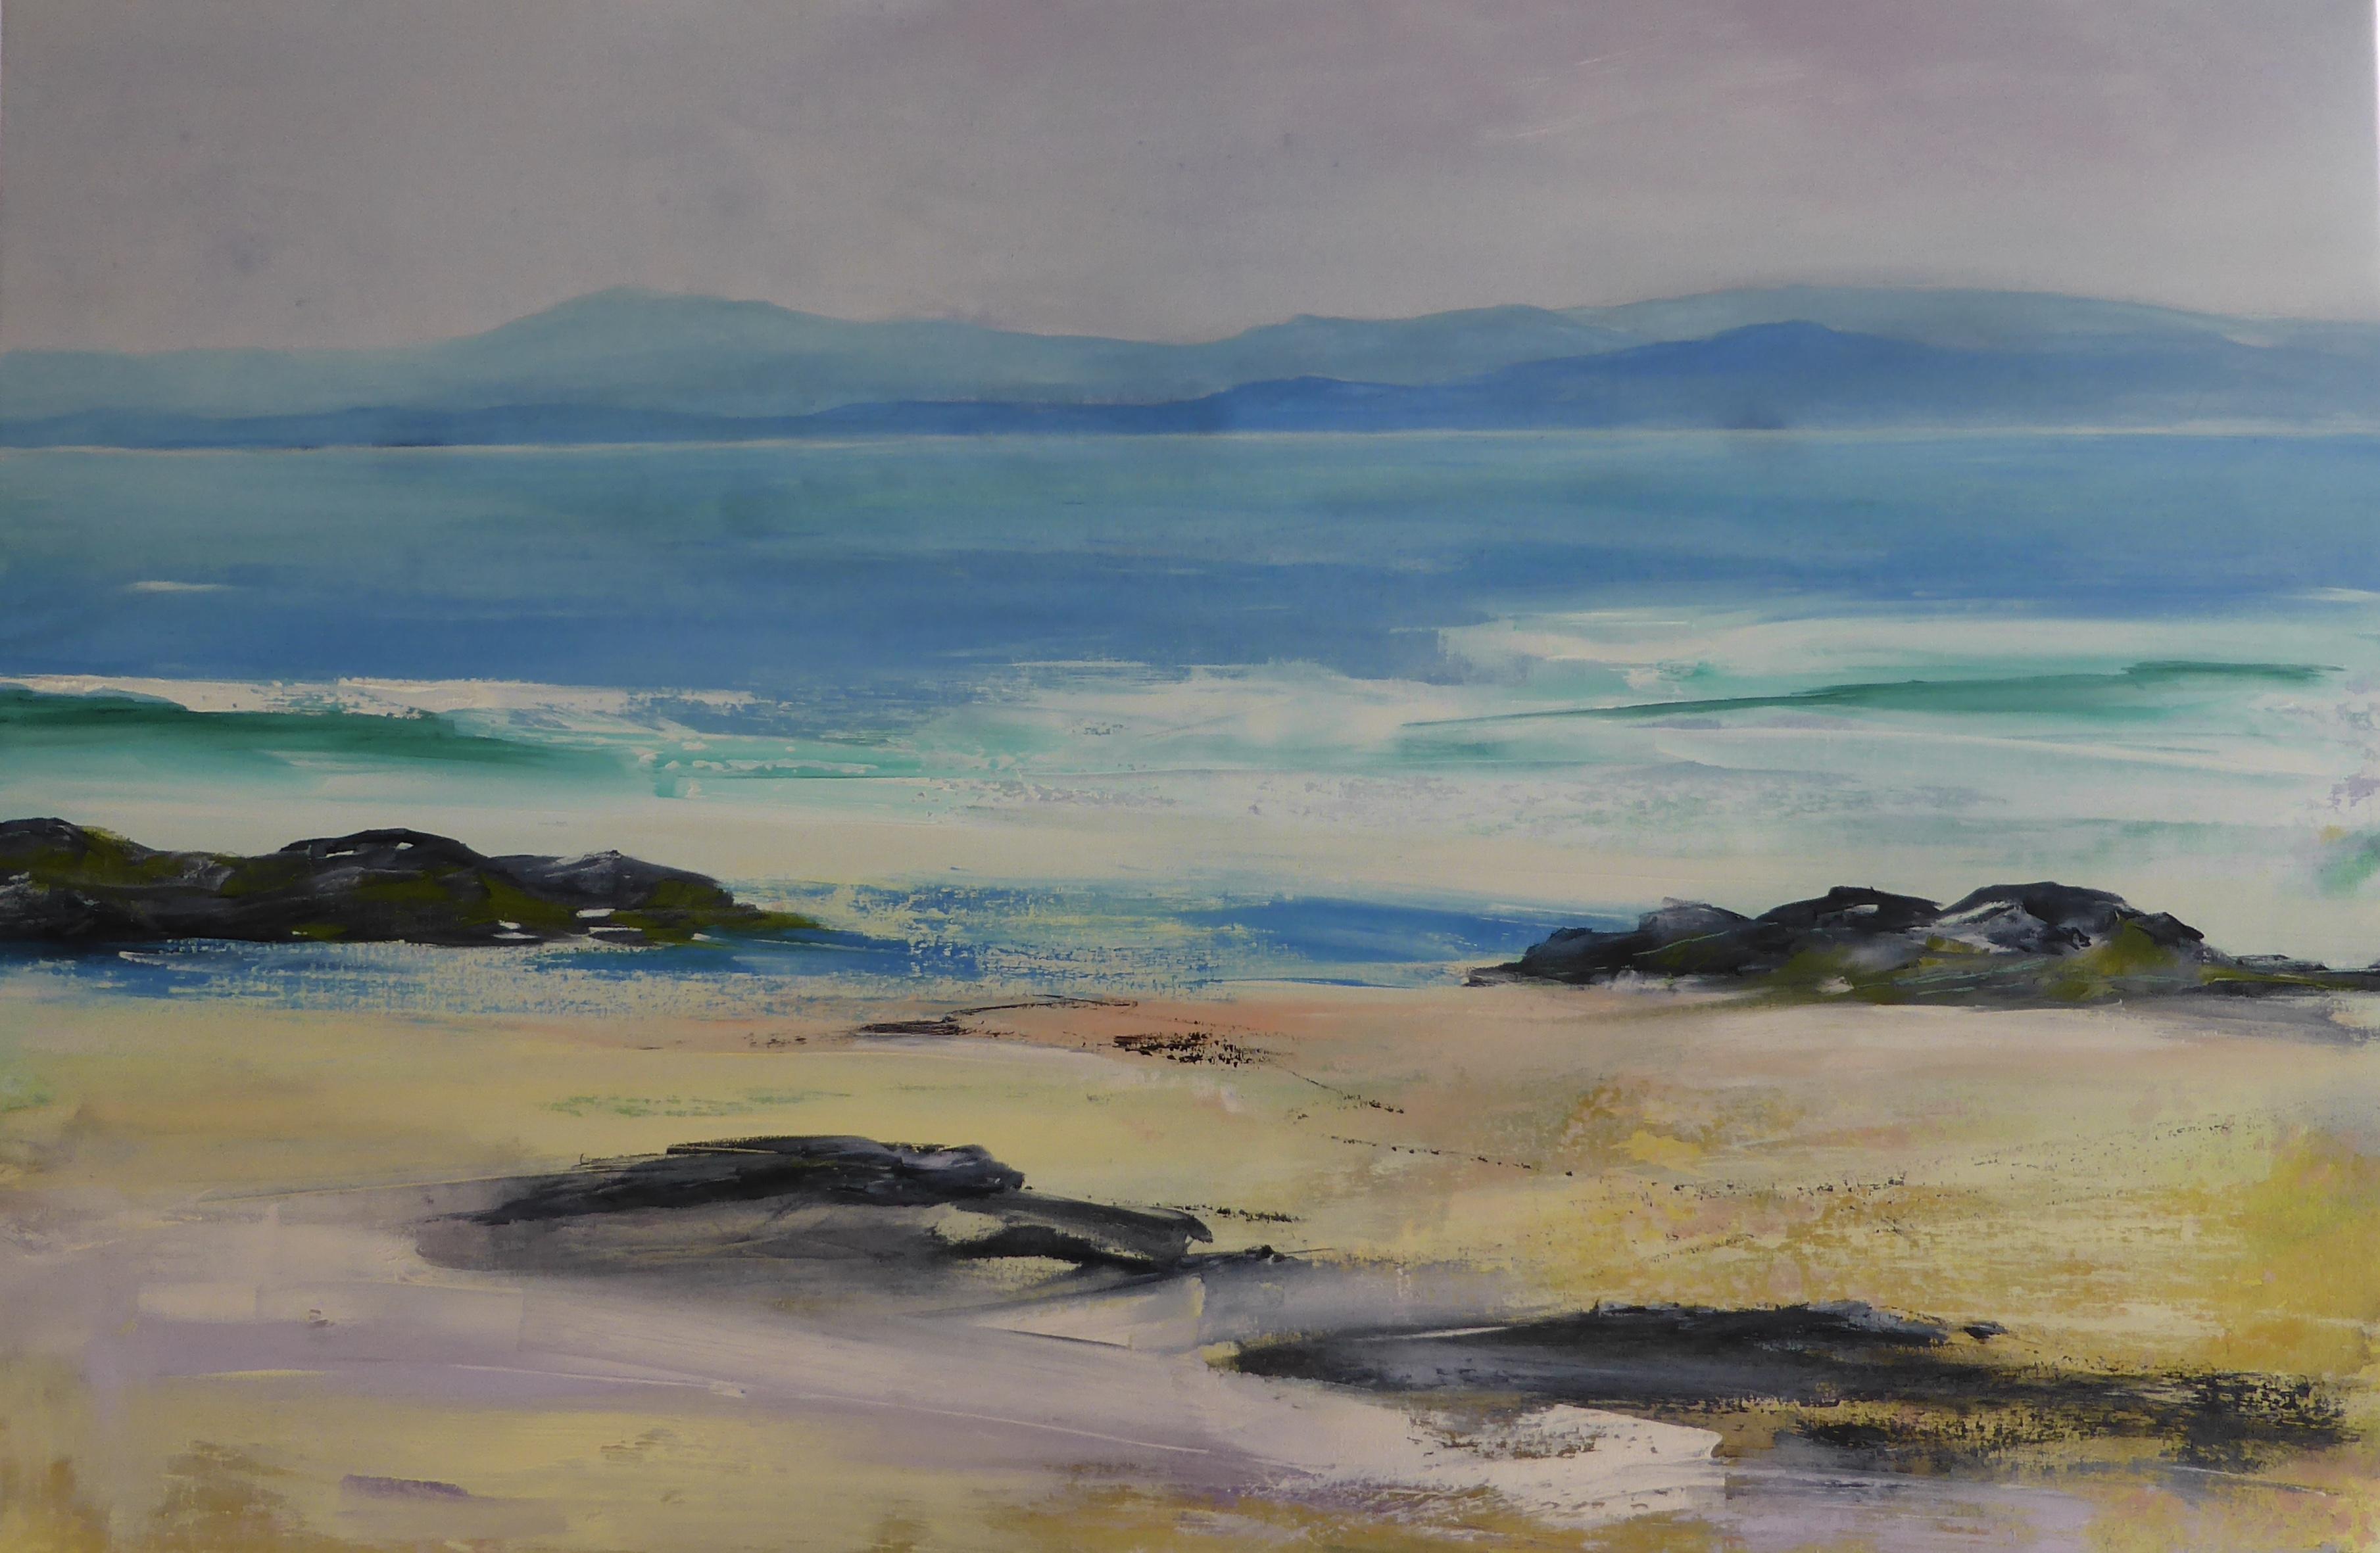 Uig Beach 2, Lewis, Scotland